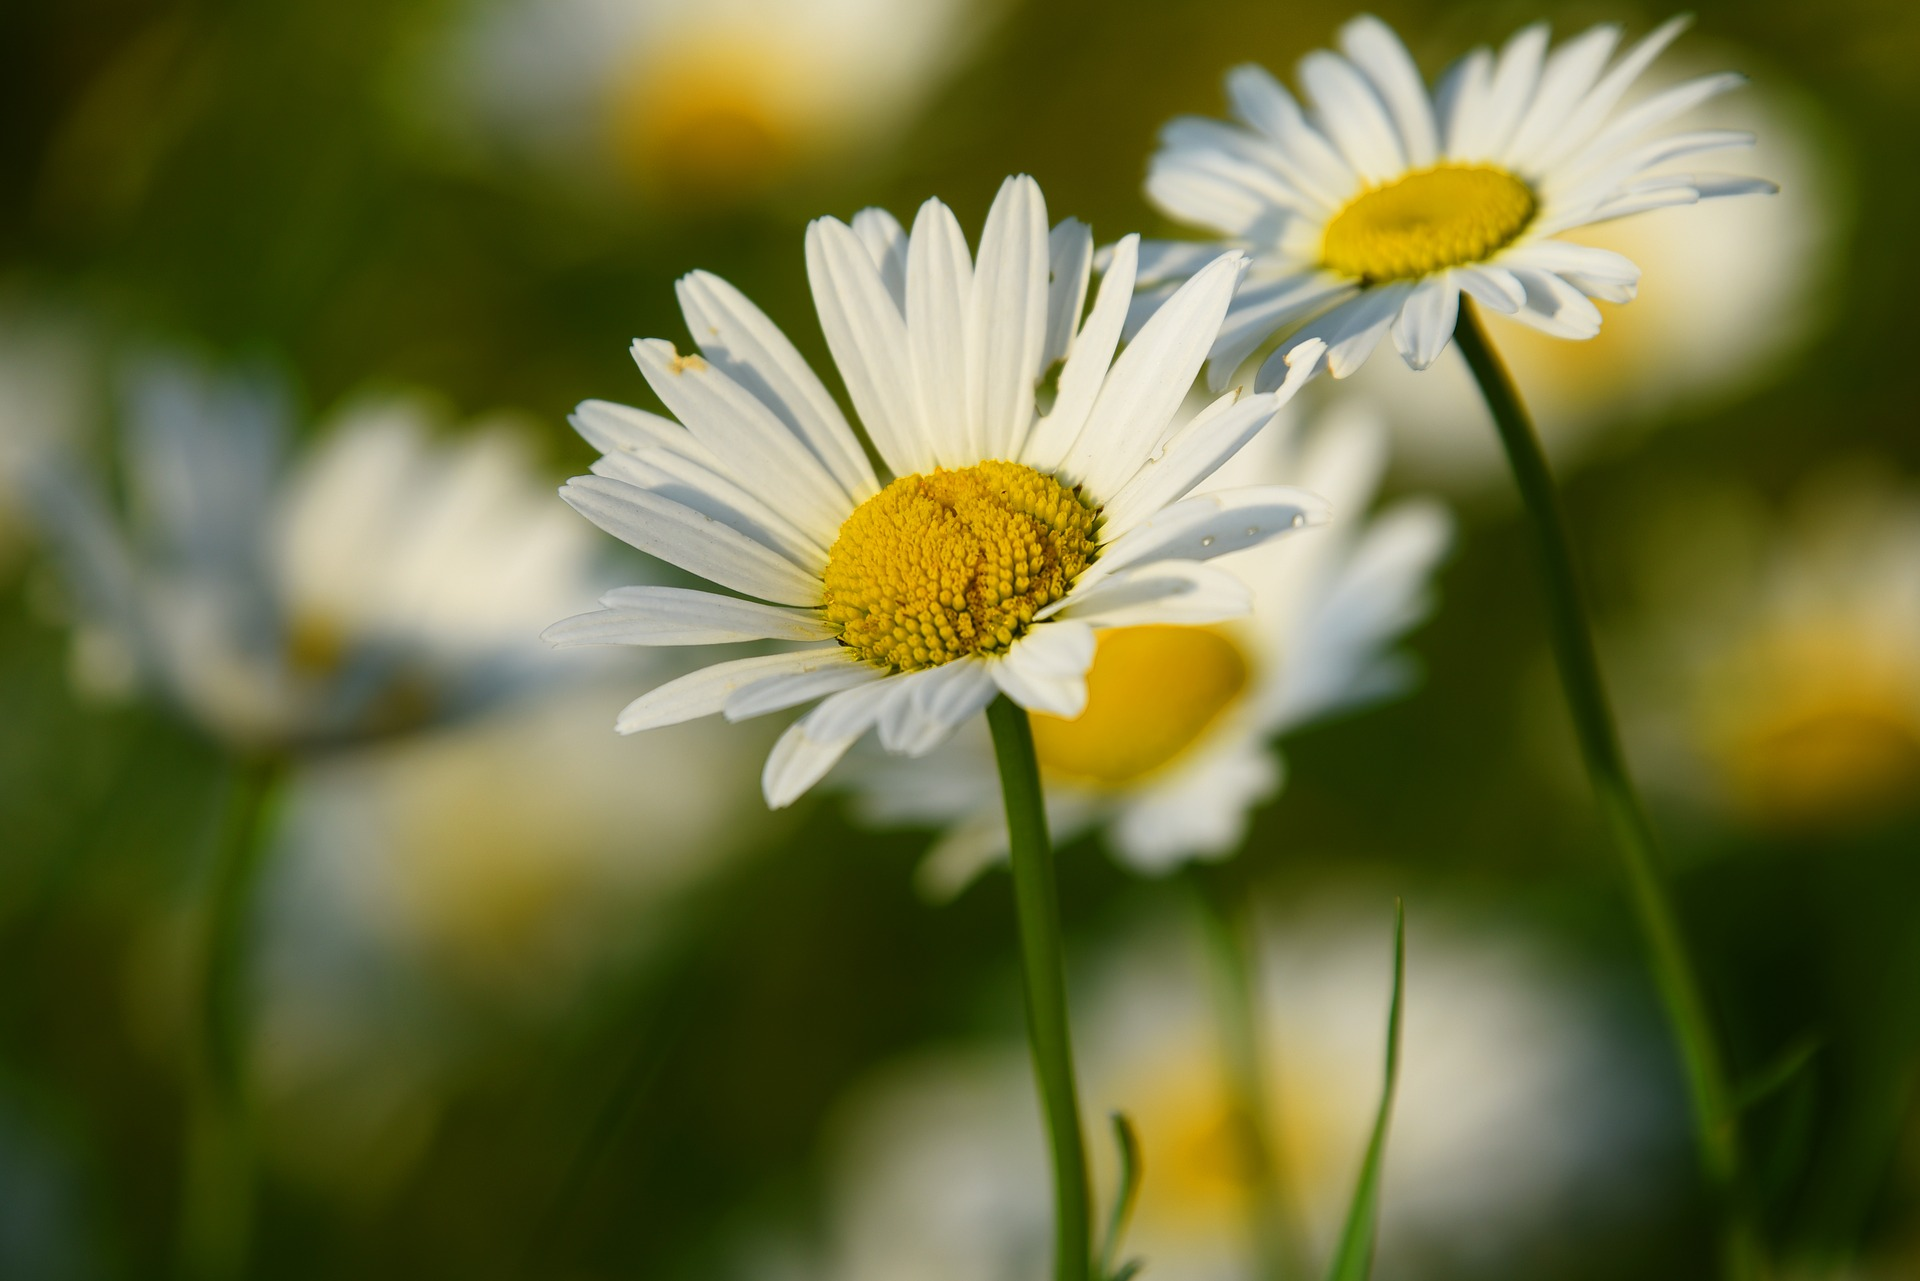 alege floarea preferata - margareta - sfatulparintilor.ro - pixabay-com - ox-eye-daisy-3454721_1920